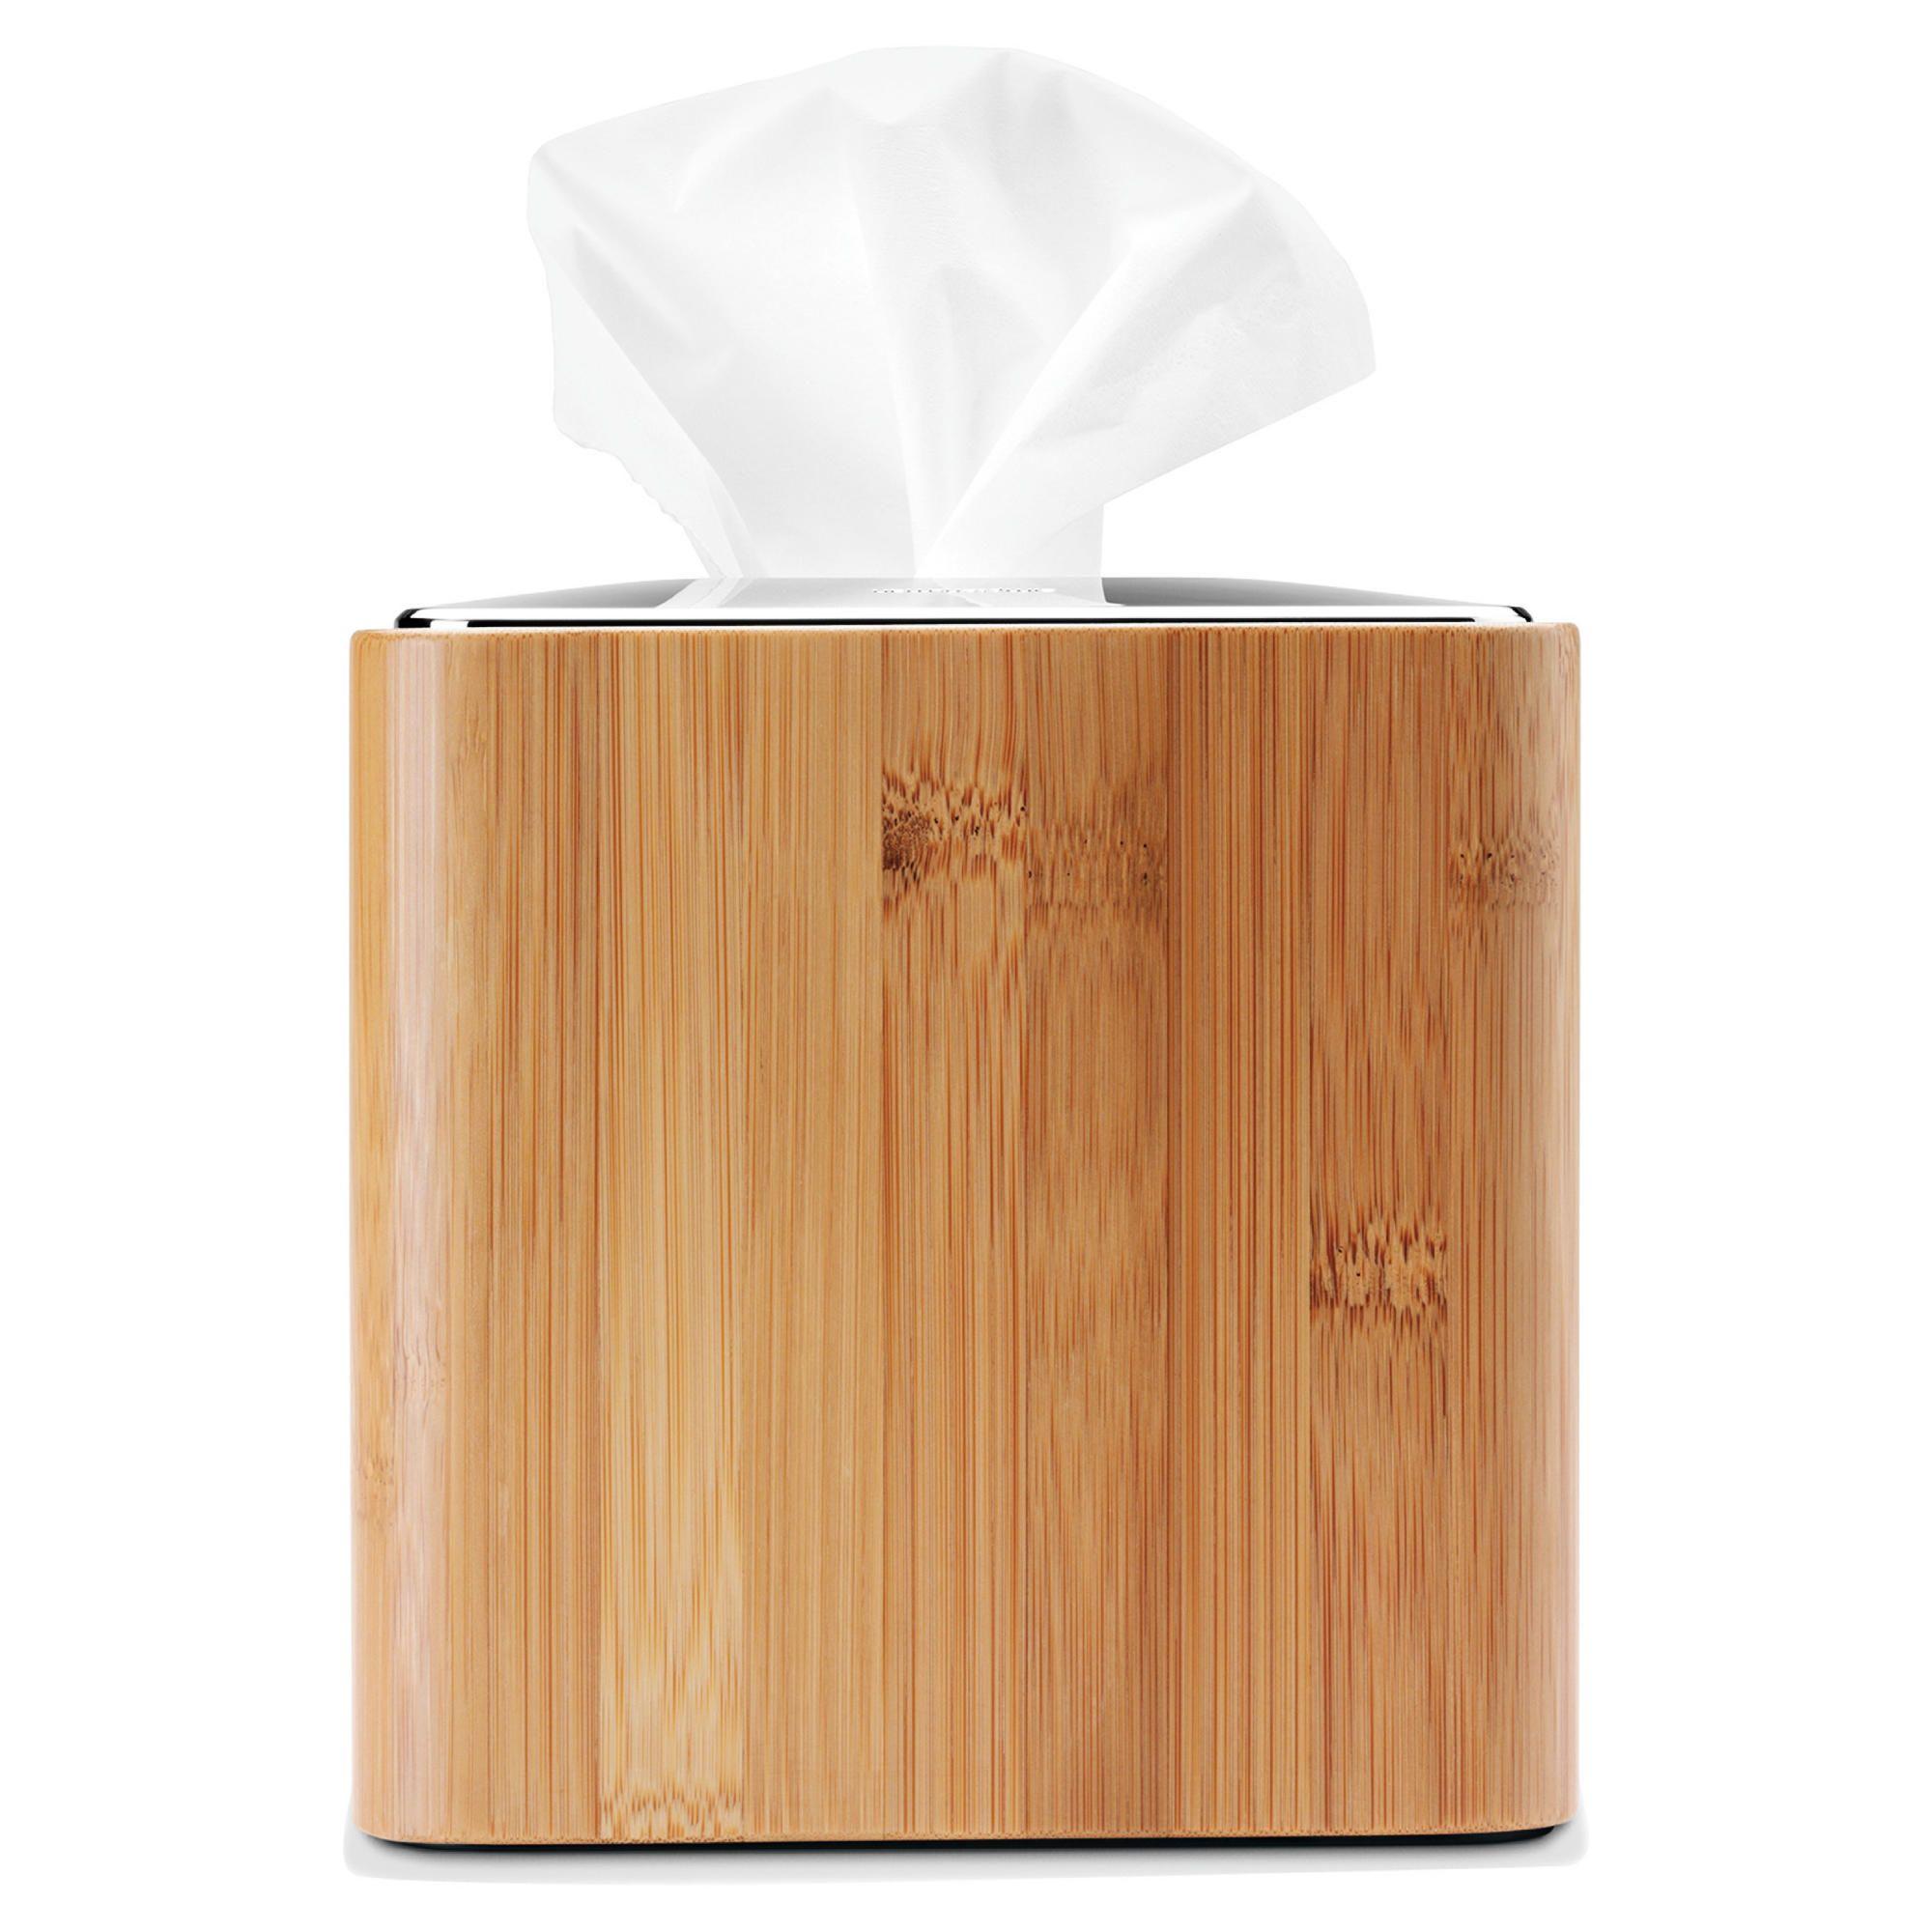 Simplehuman Bamboo Square Tissue Box